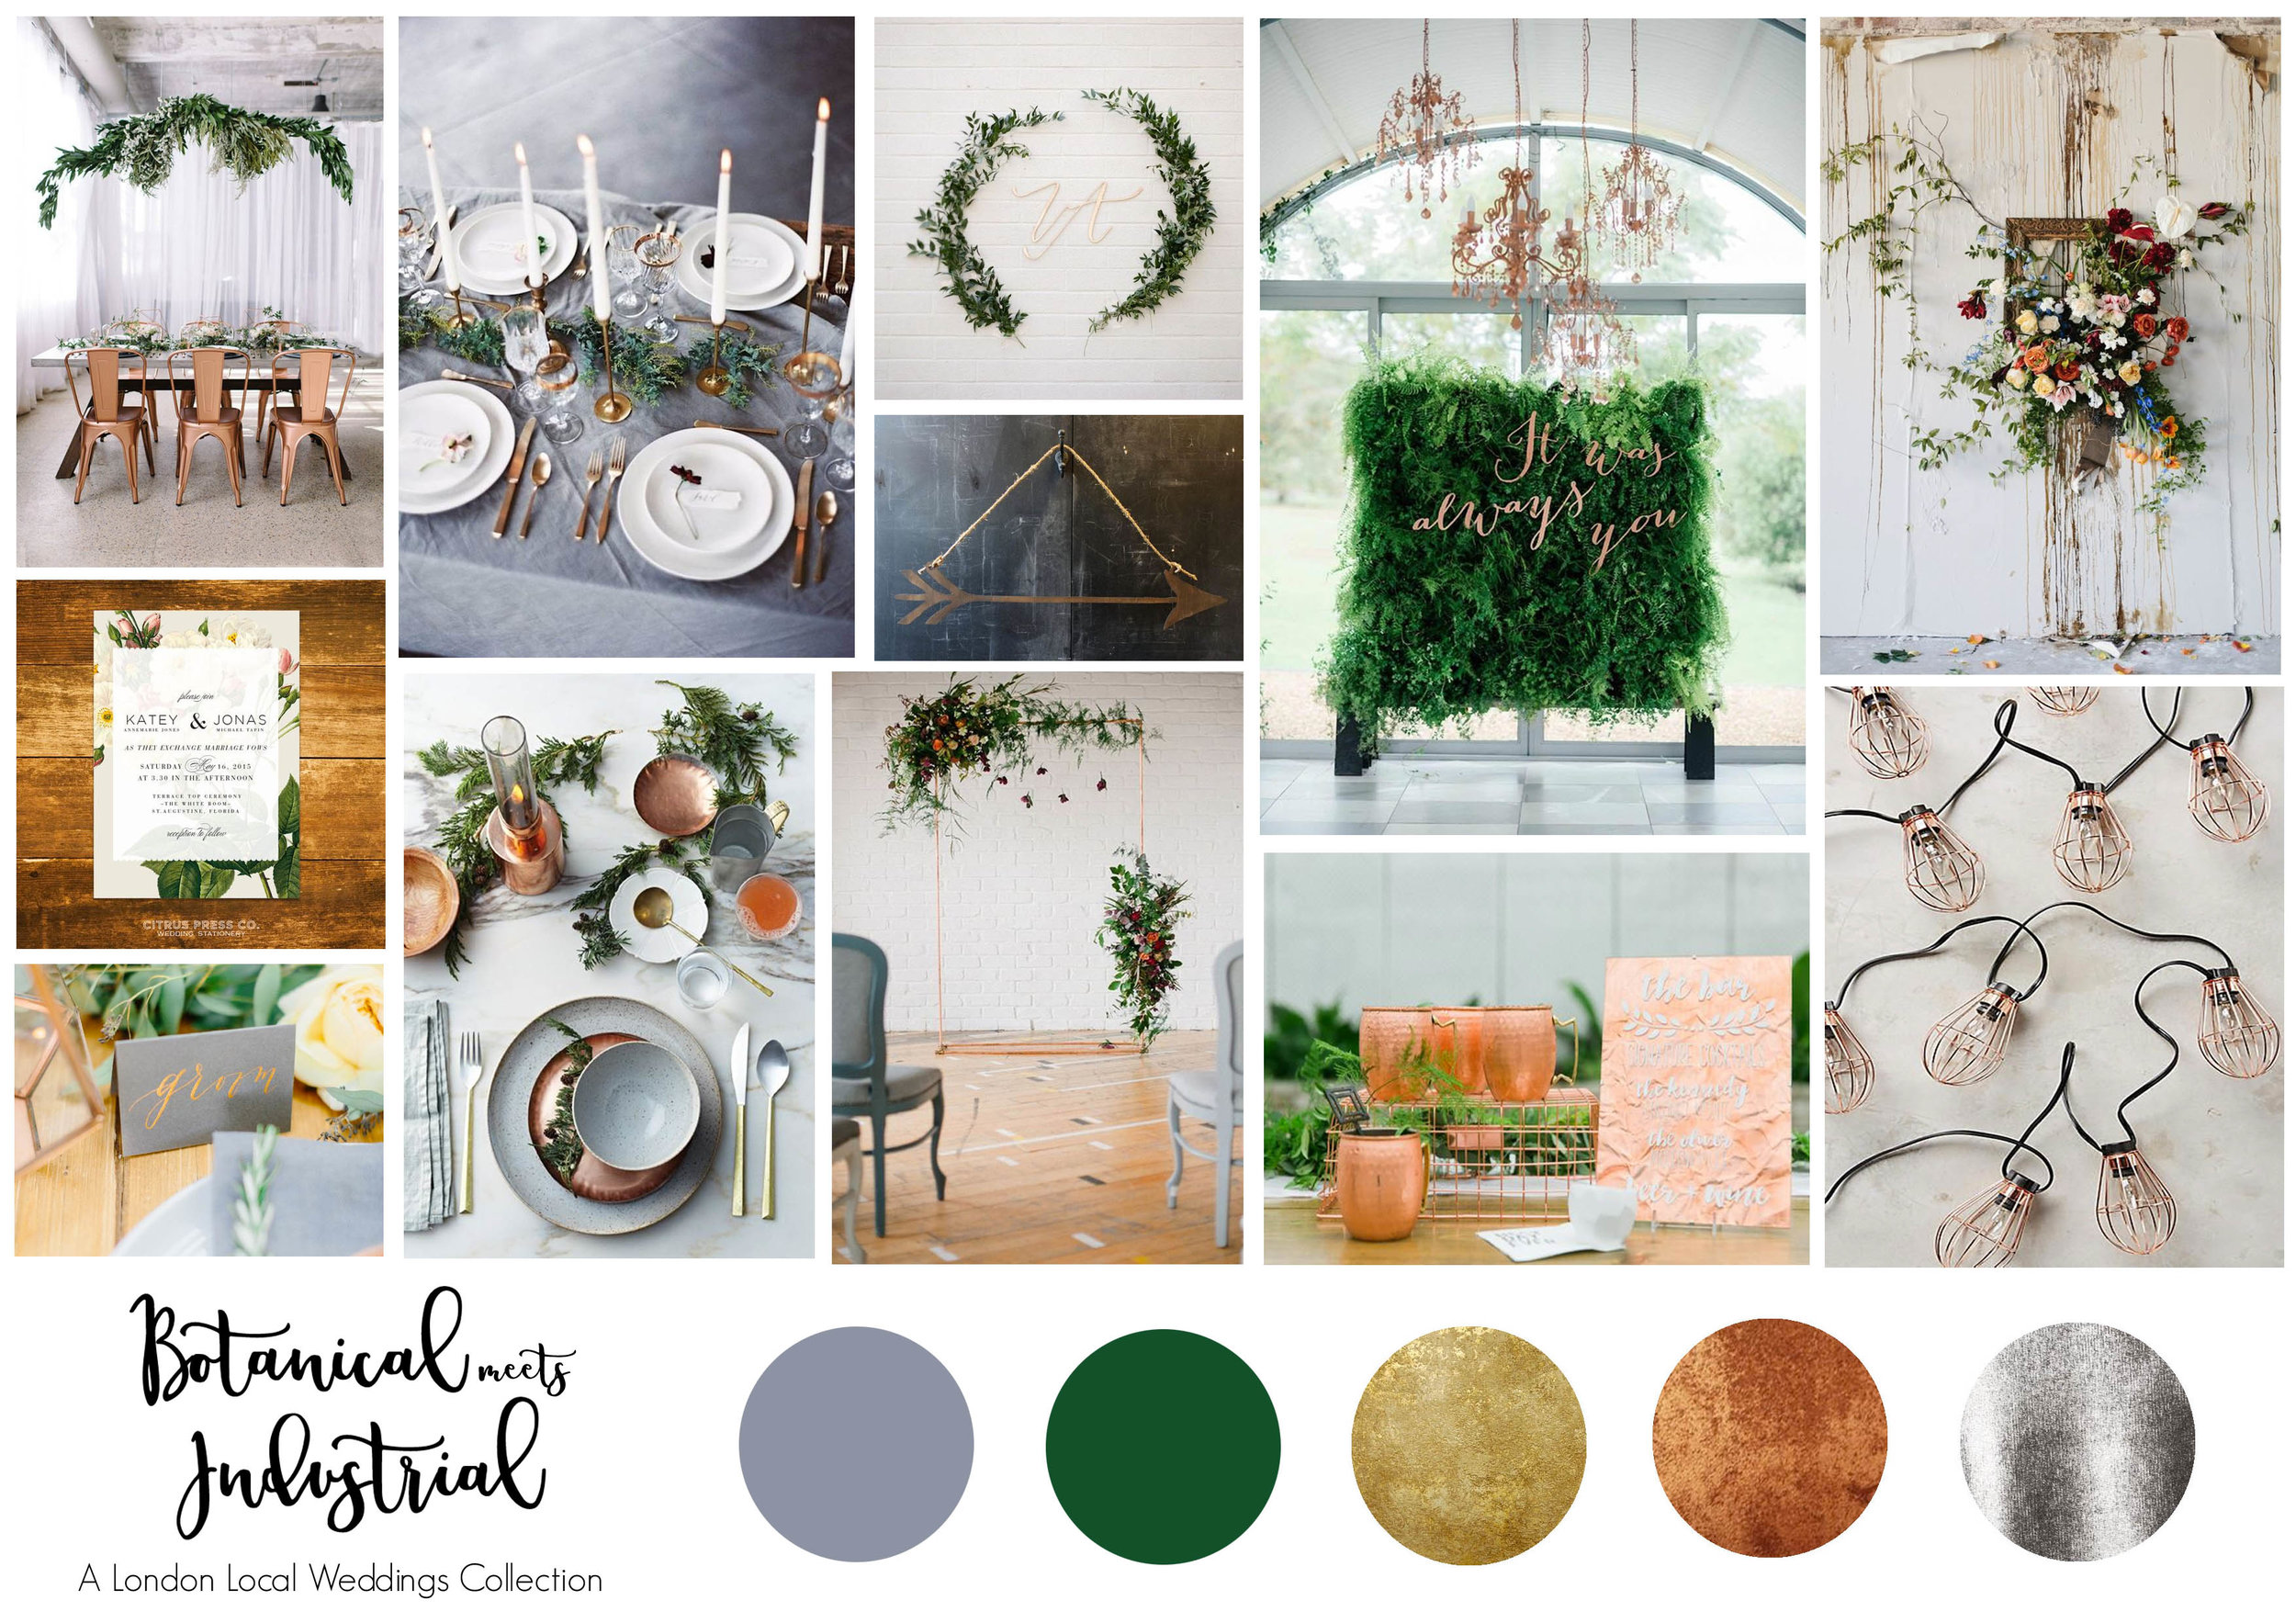 Botanical_Meets_Industrial_Mood Board_Rachel.jpg